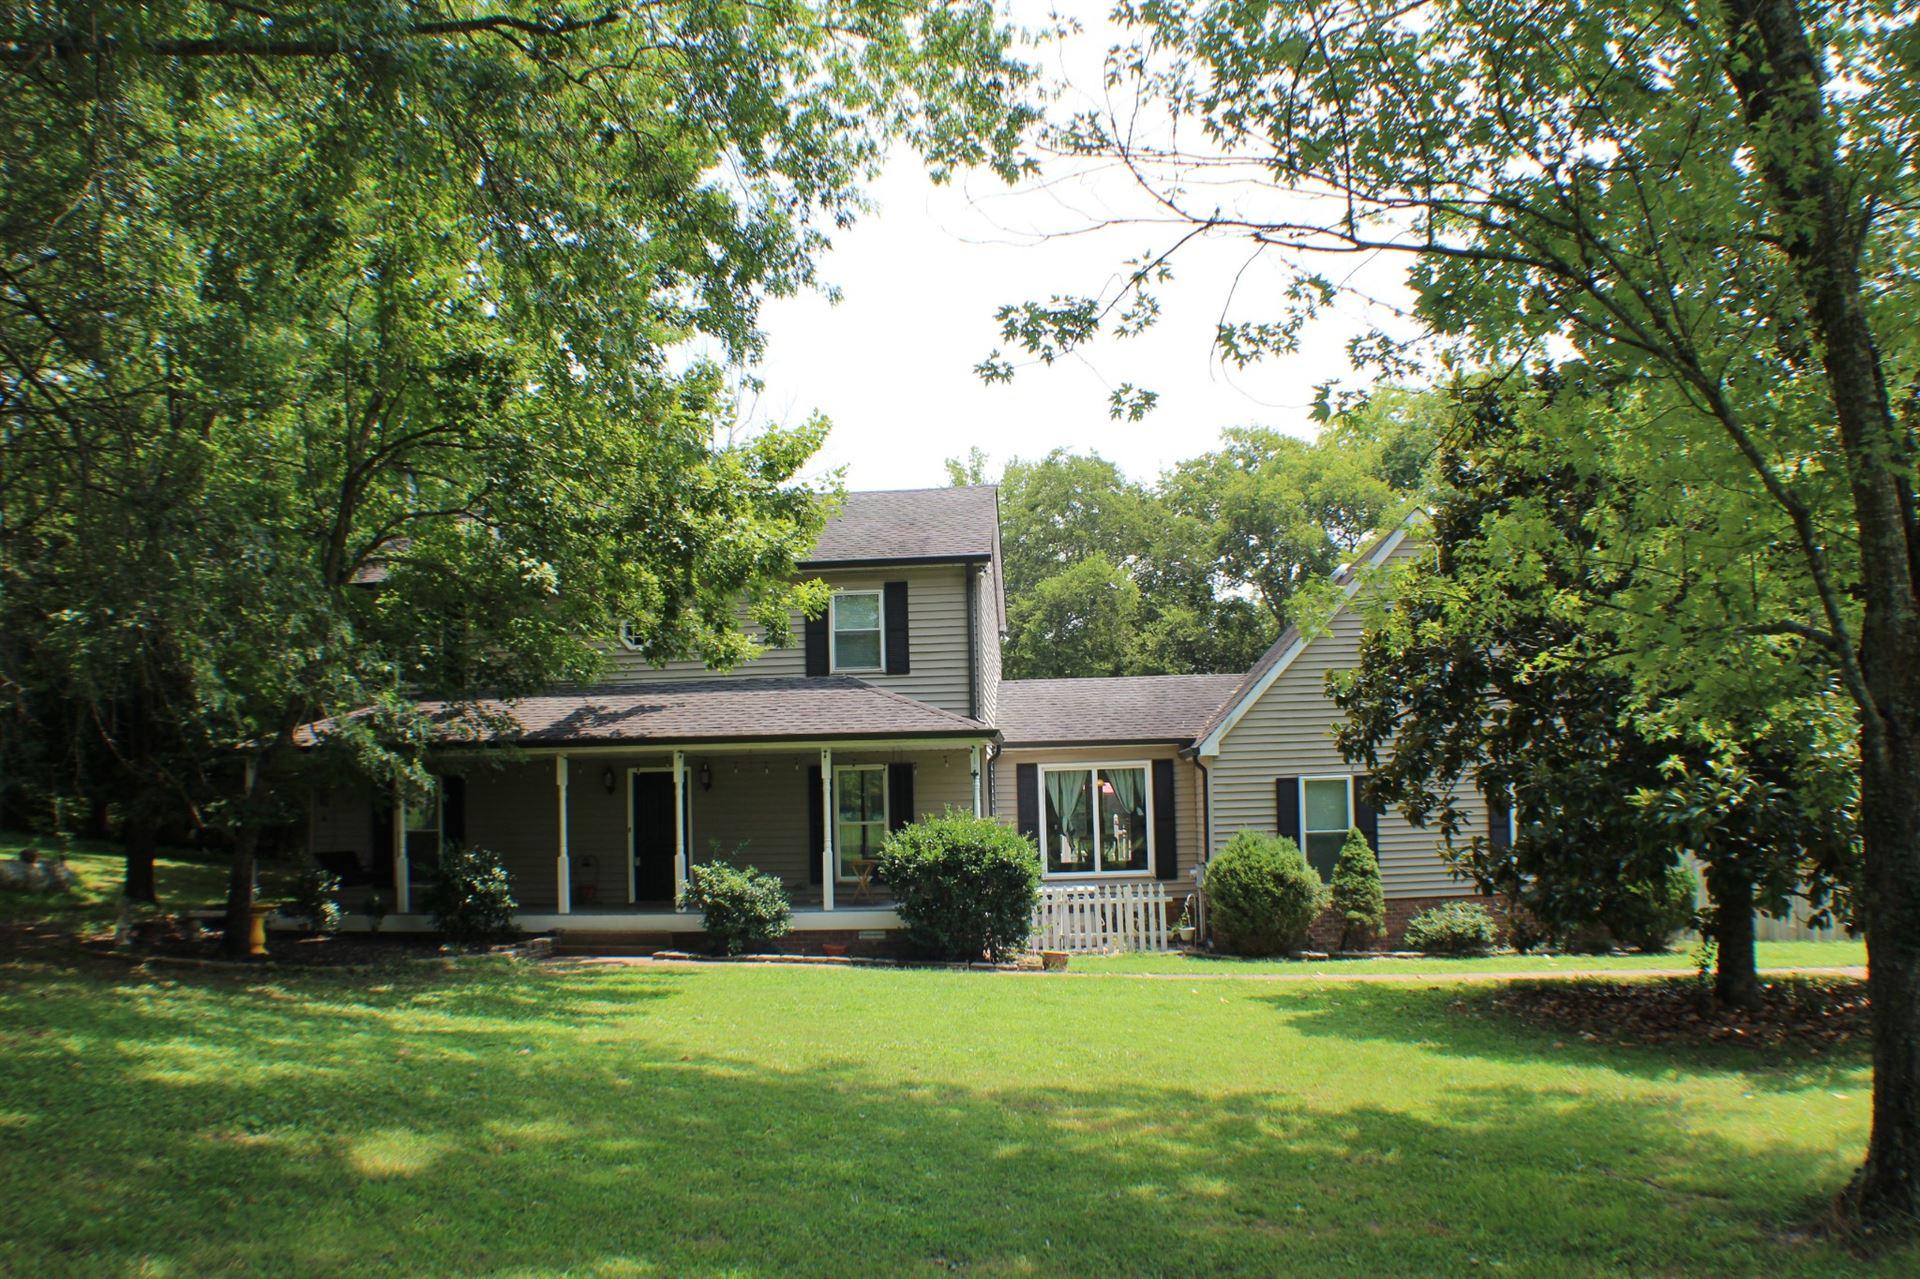 1610 Anderson Rd, Hendersonville, TN 37075 - MLS#: 2278188